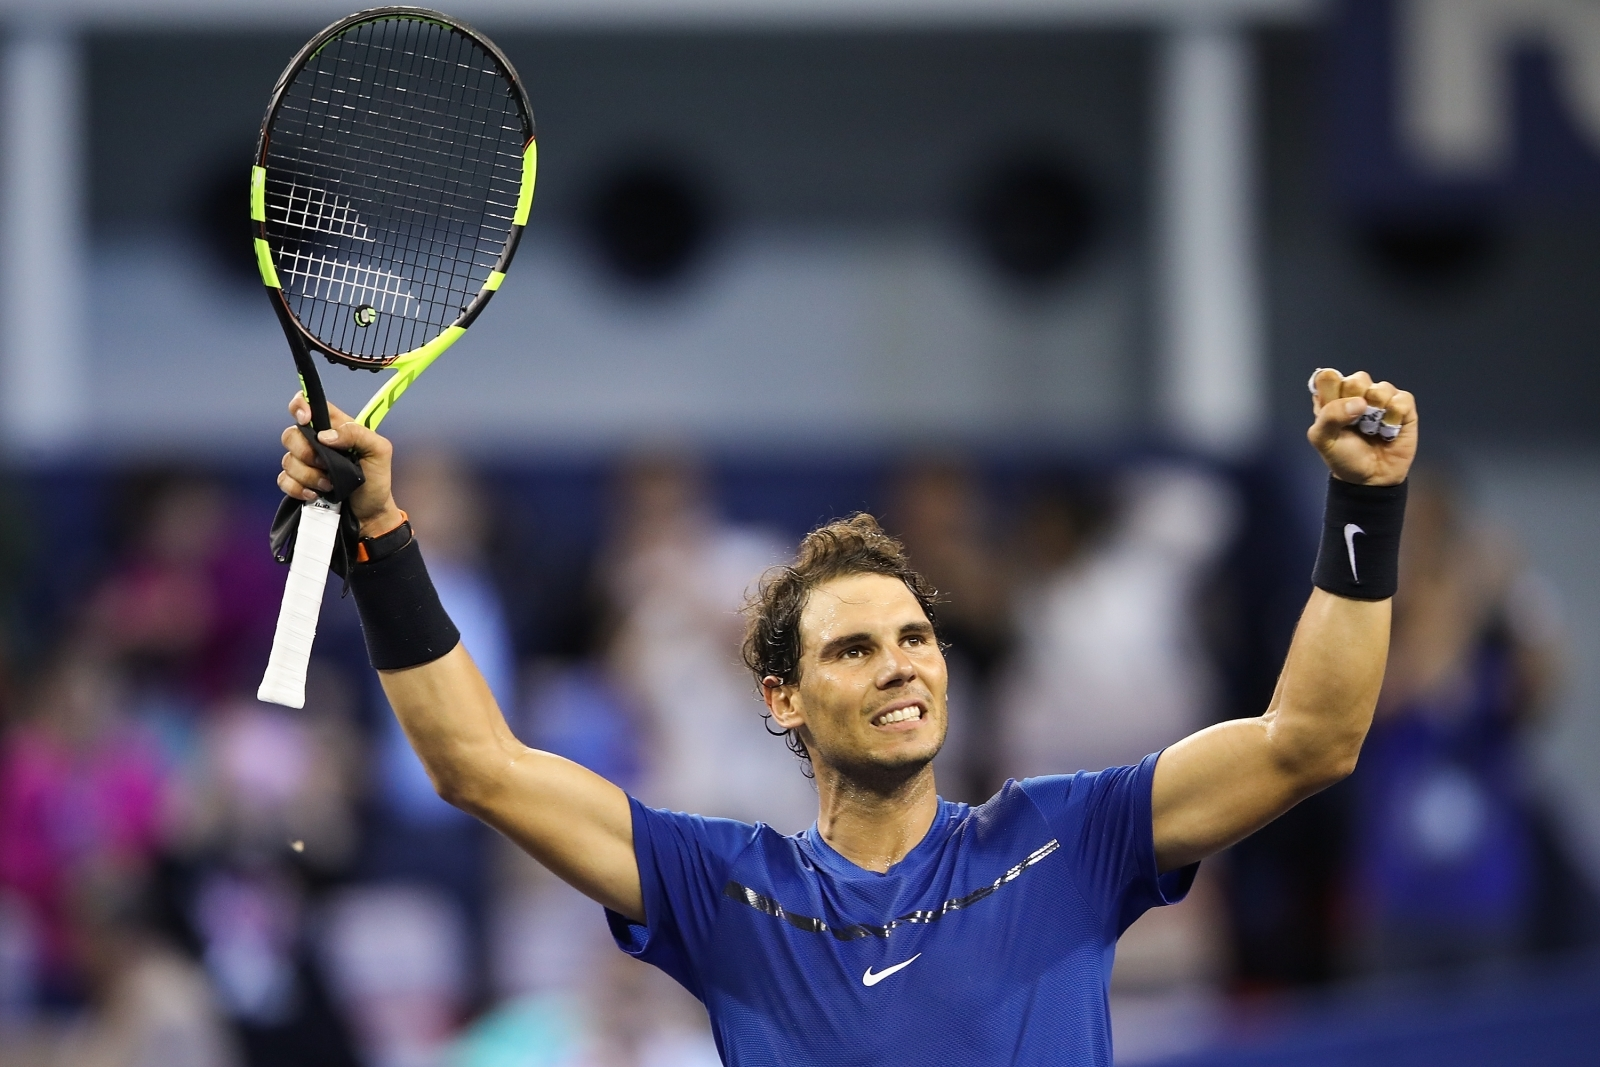 Roger Federer names one regret from 2017 battle with Rafael Nadal